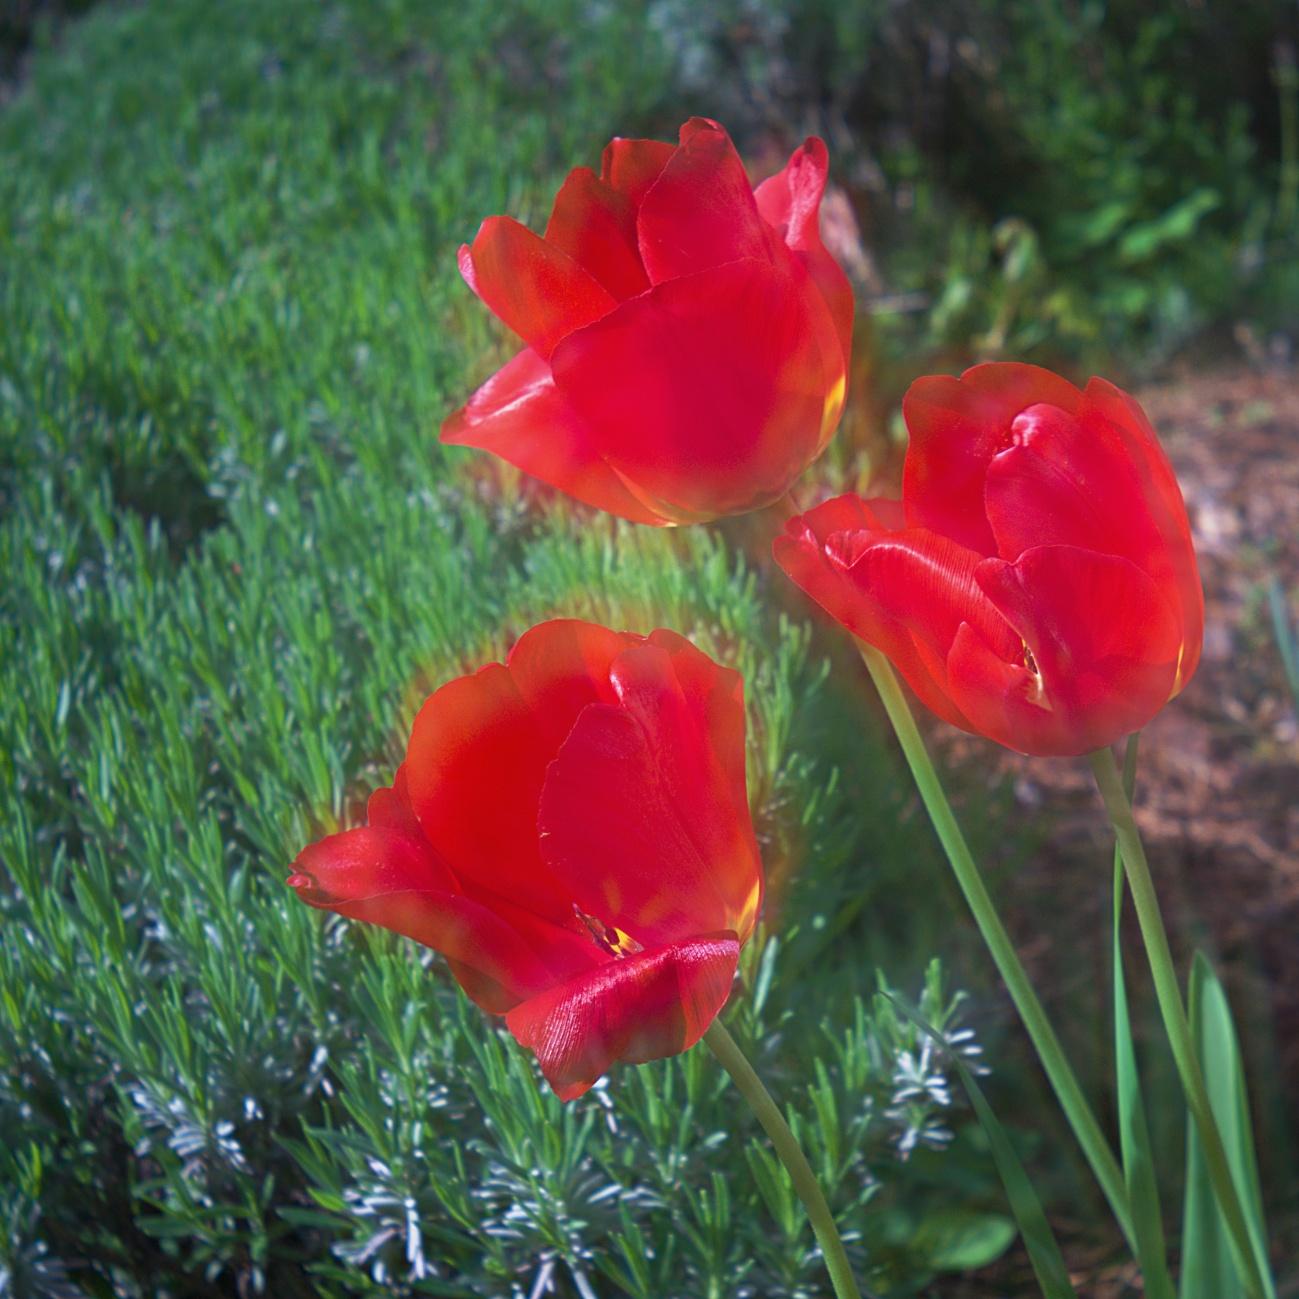 Bilder des Tages #73 — Verträumte Tulpen & Co.